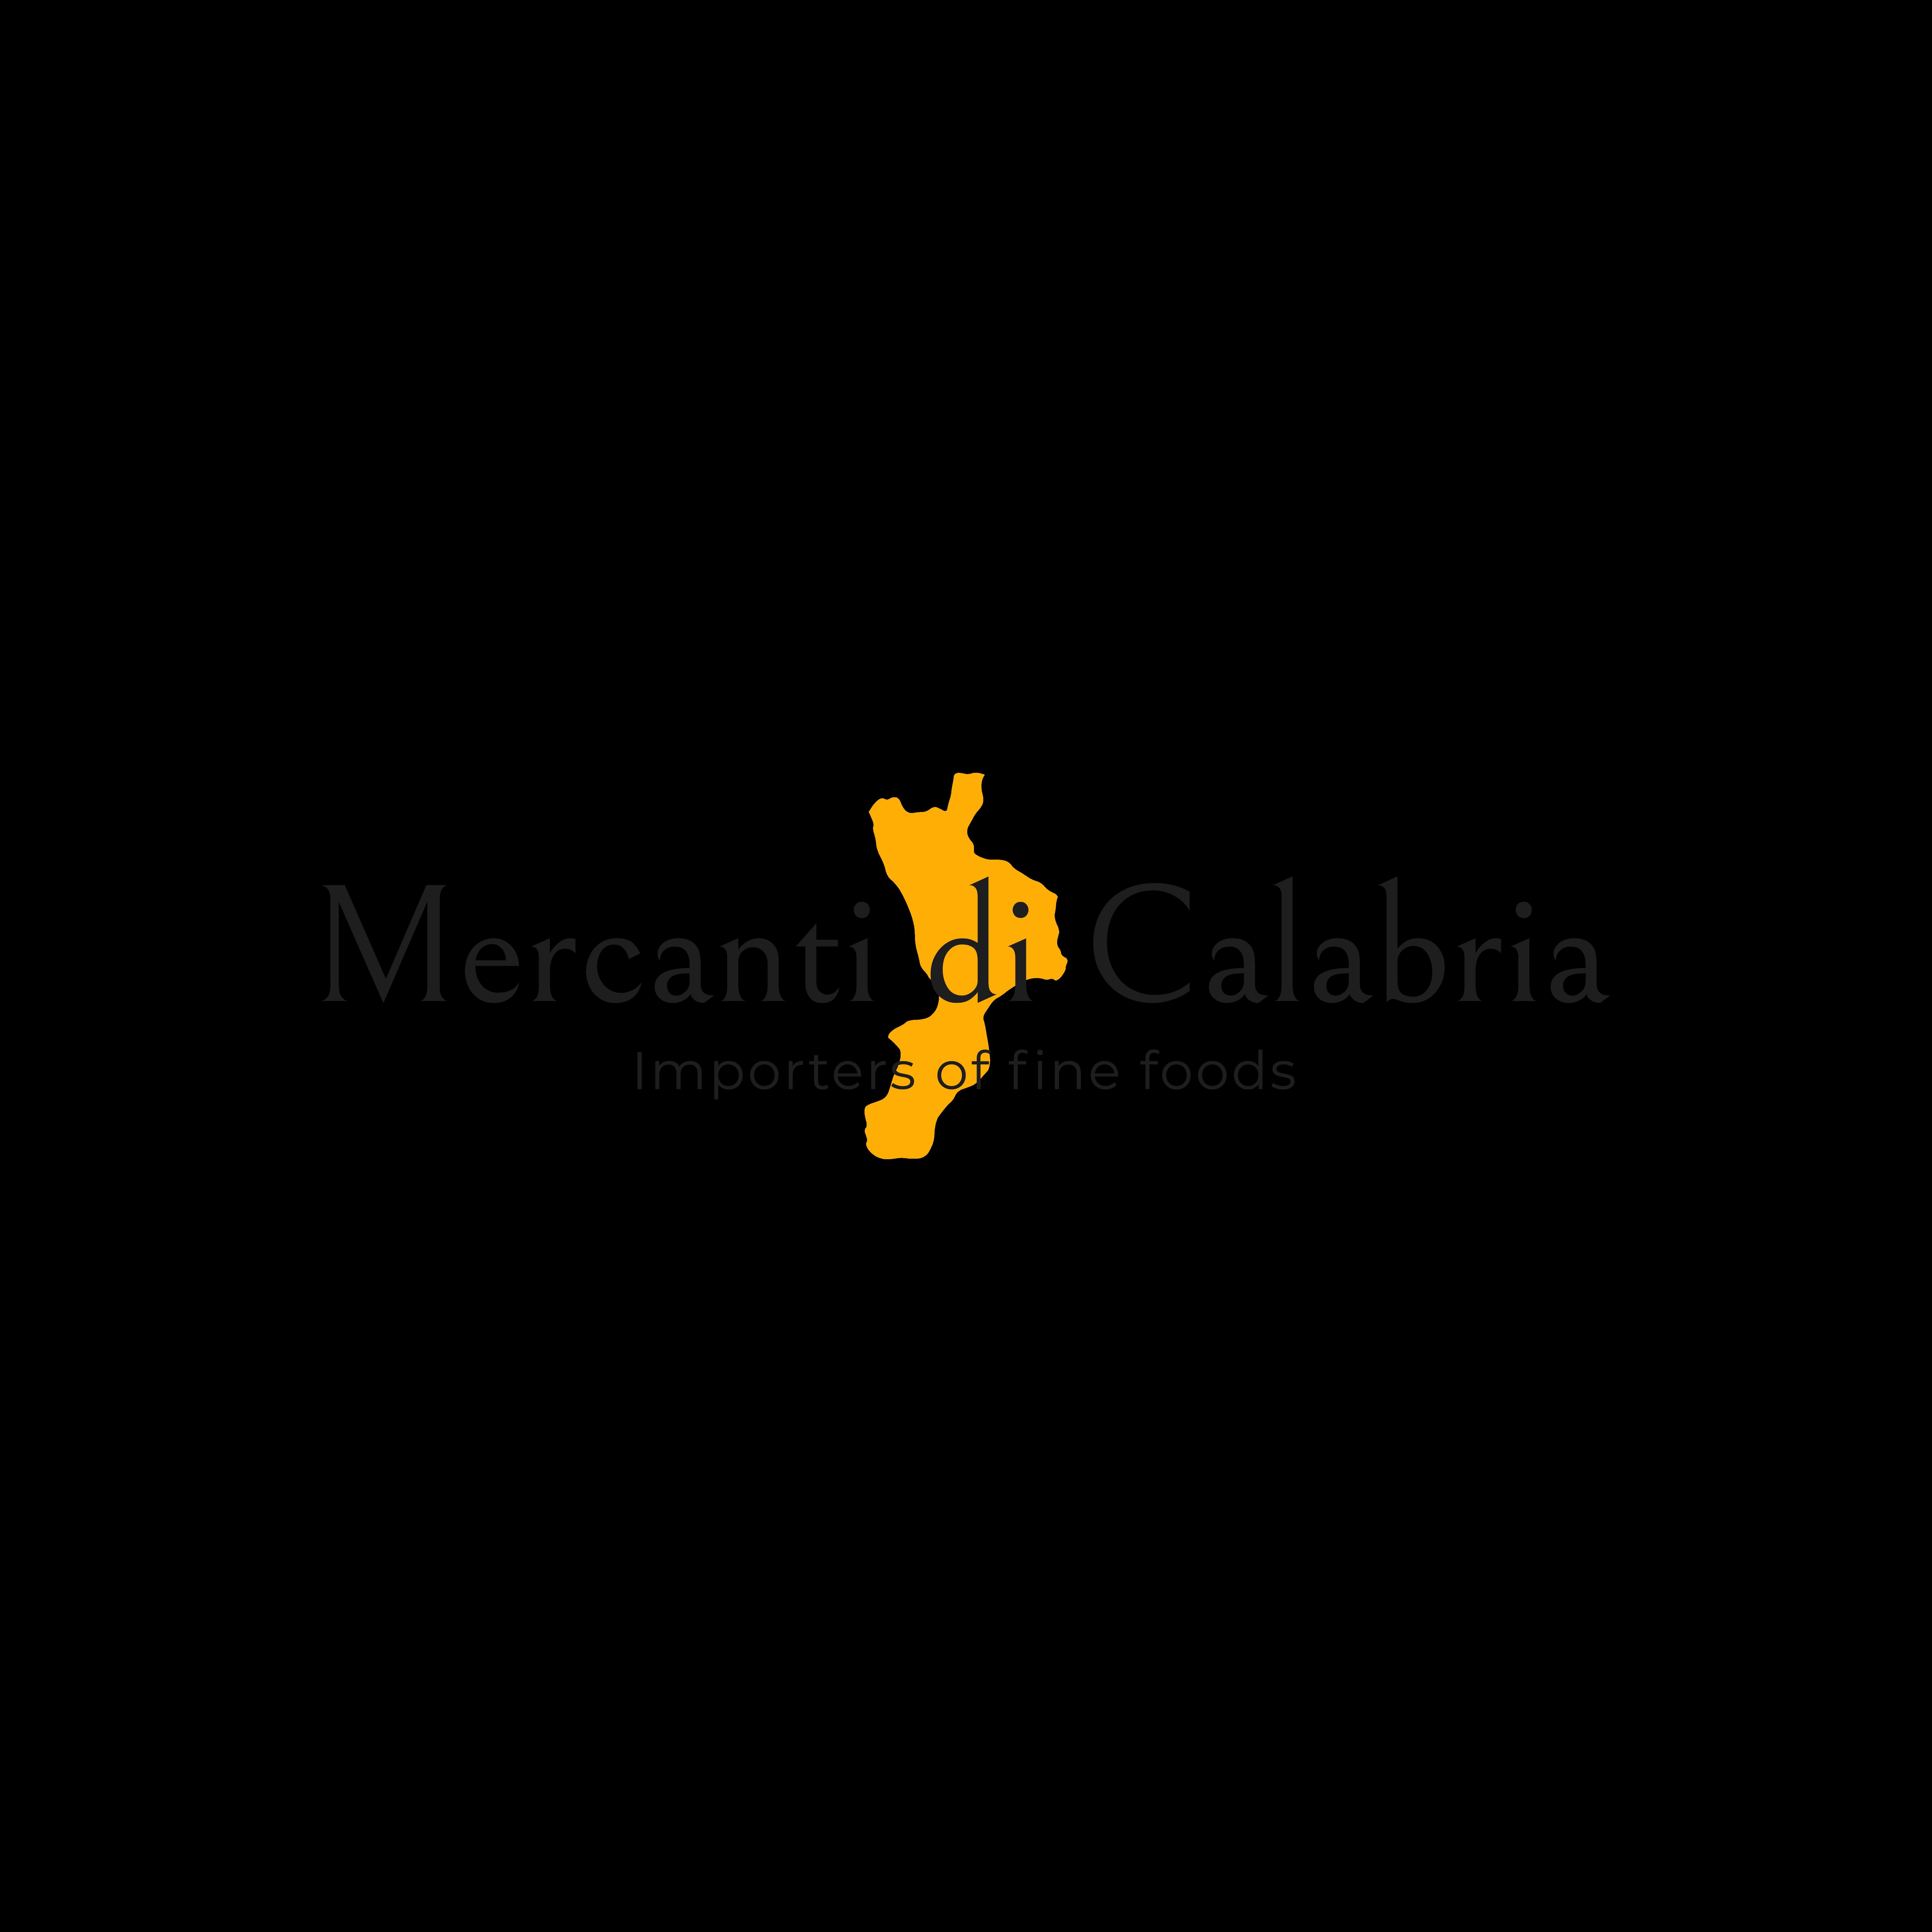 Mercanti di Calabria